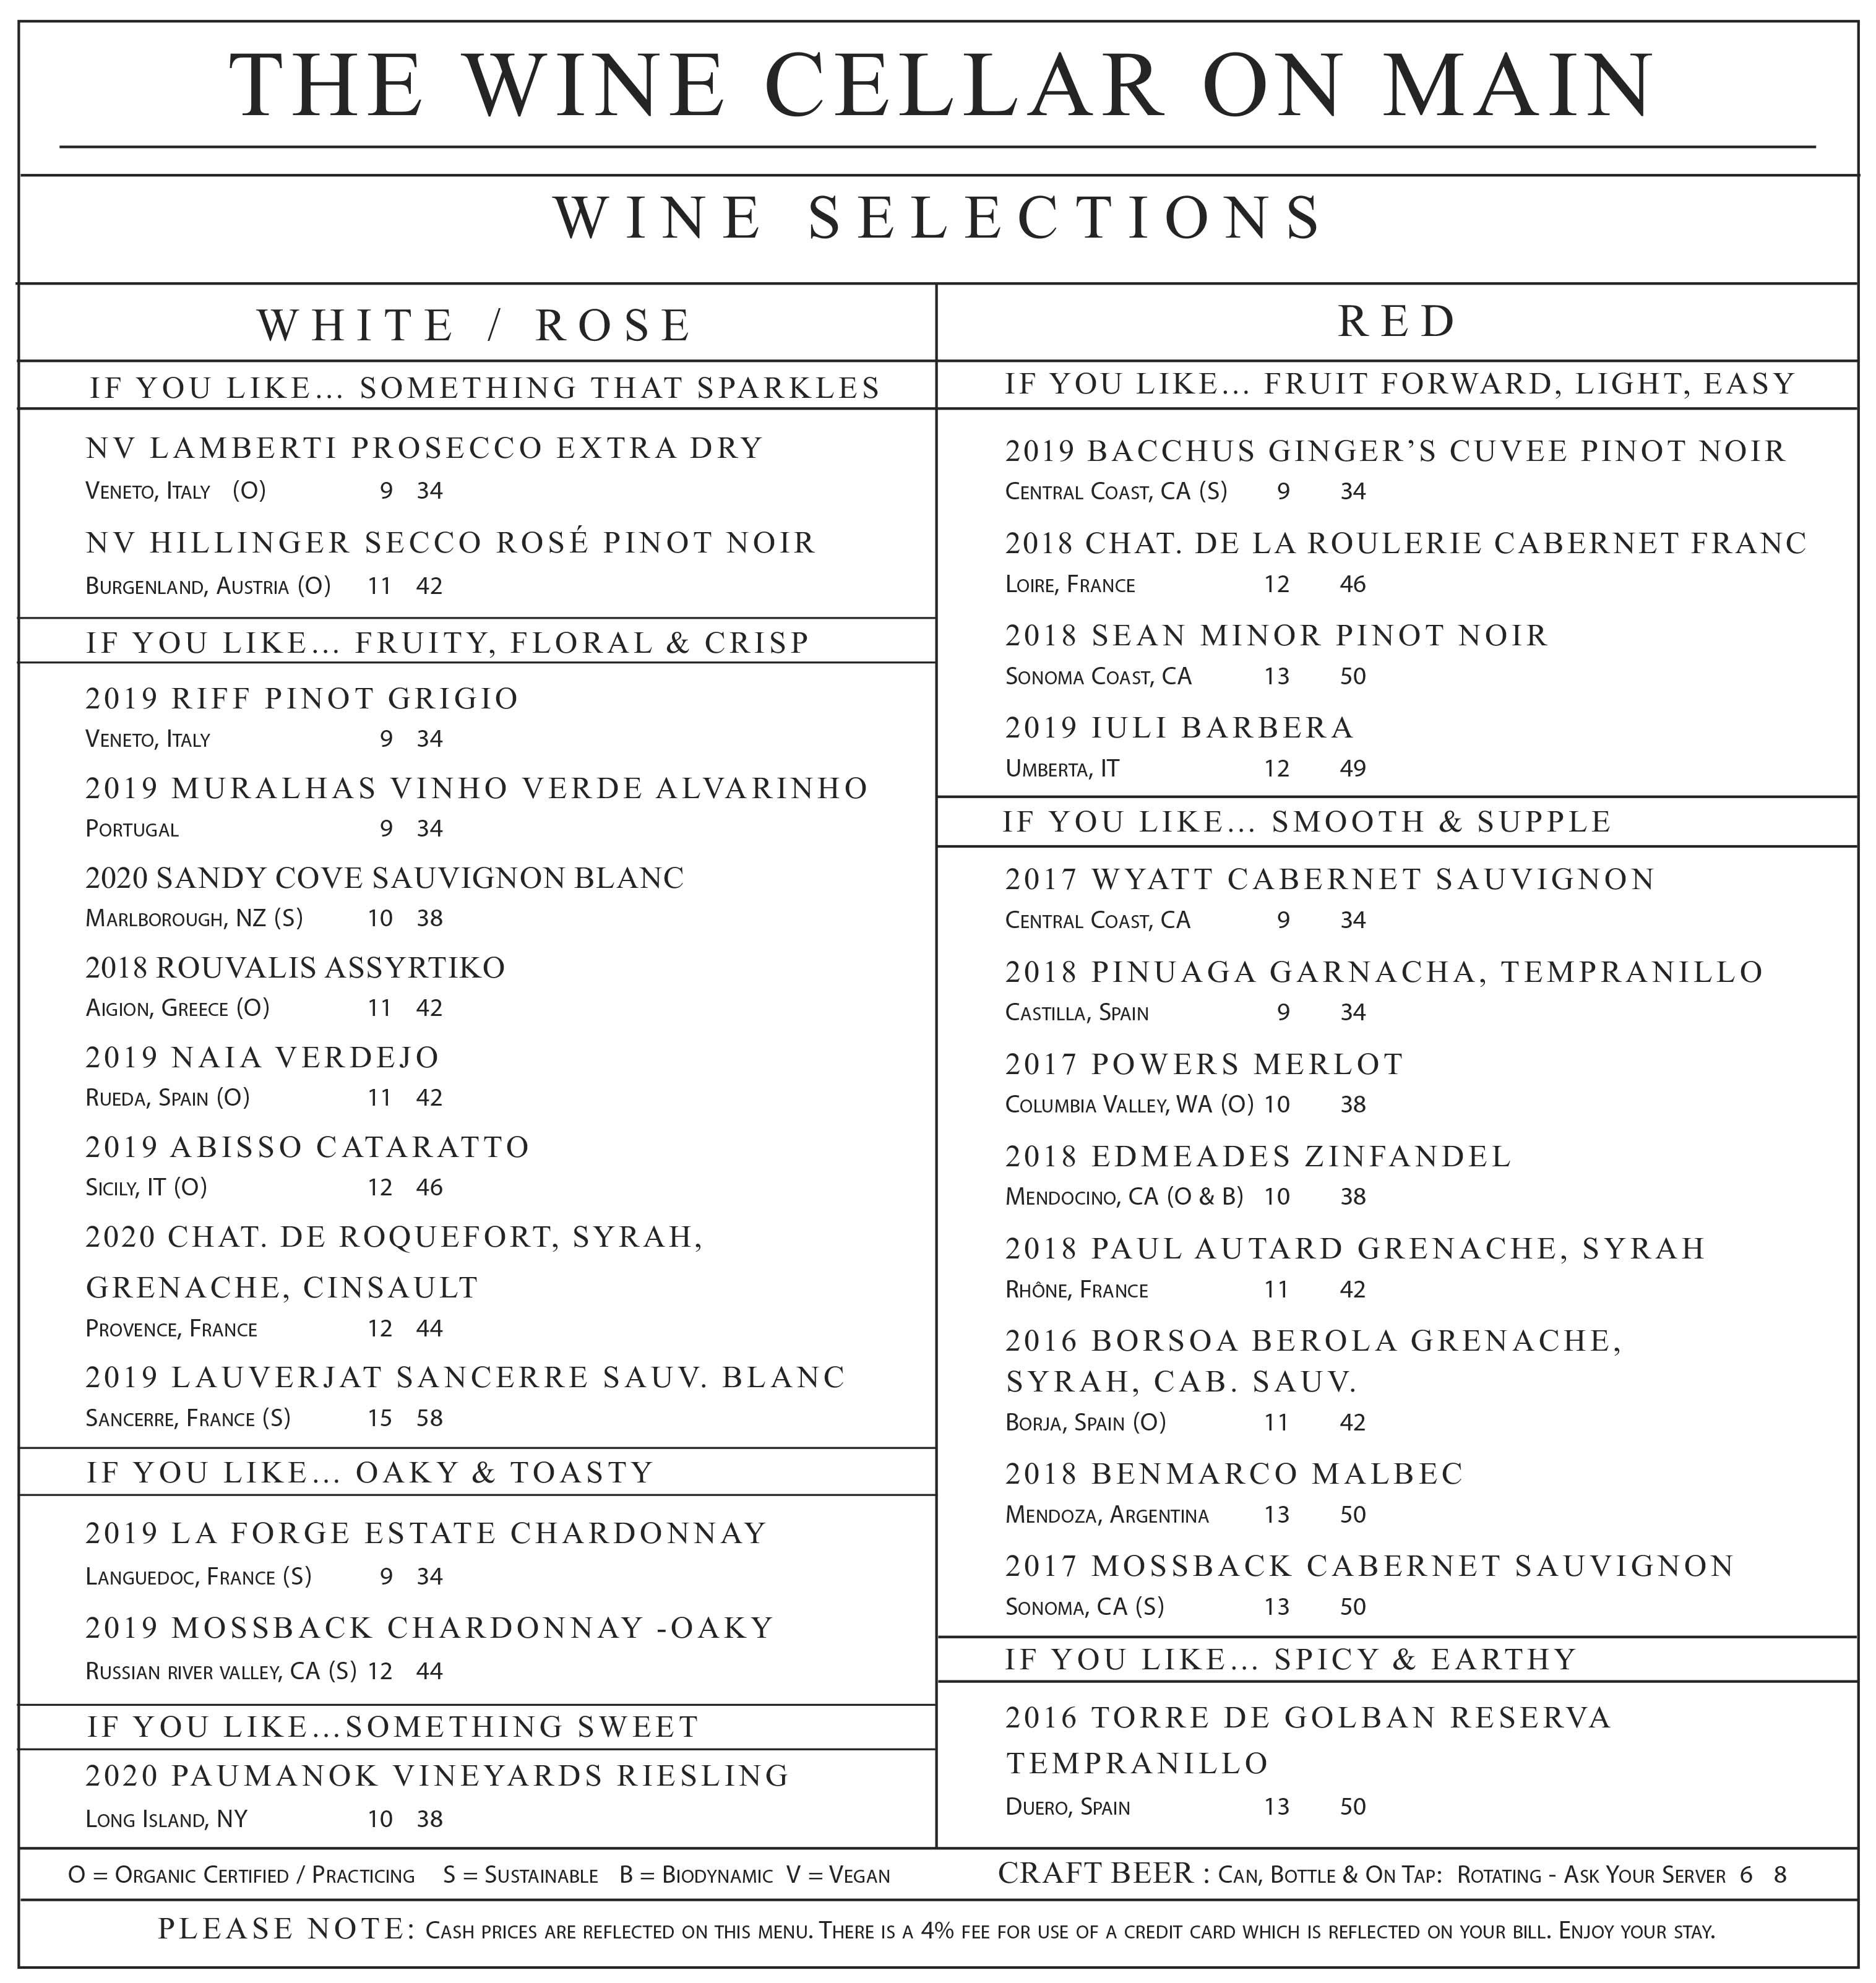 wine-cellar421-1.jpg